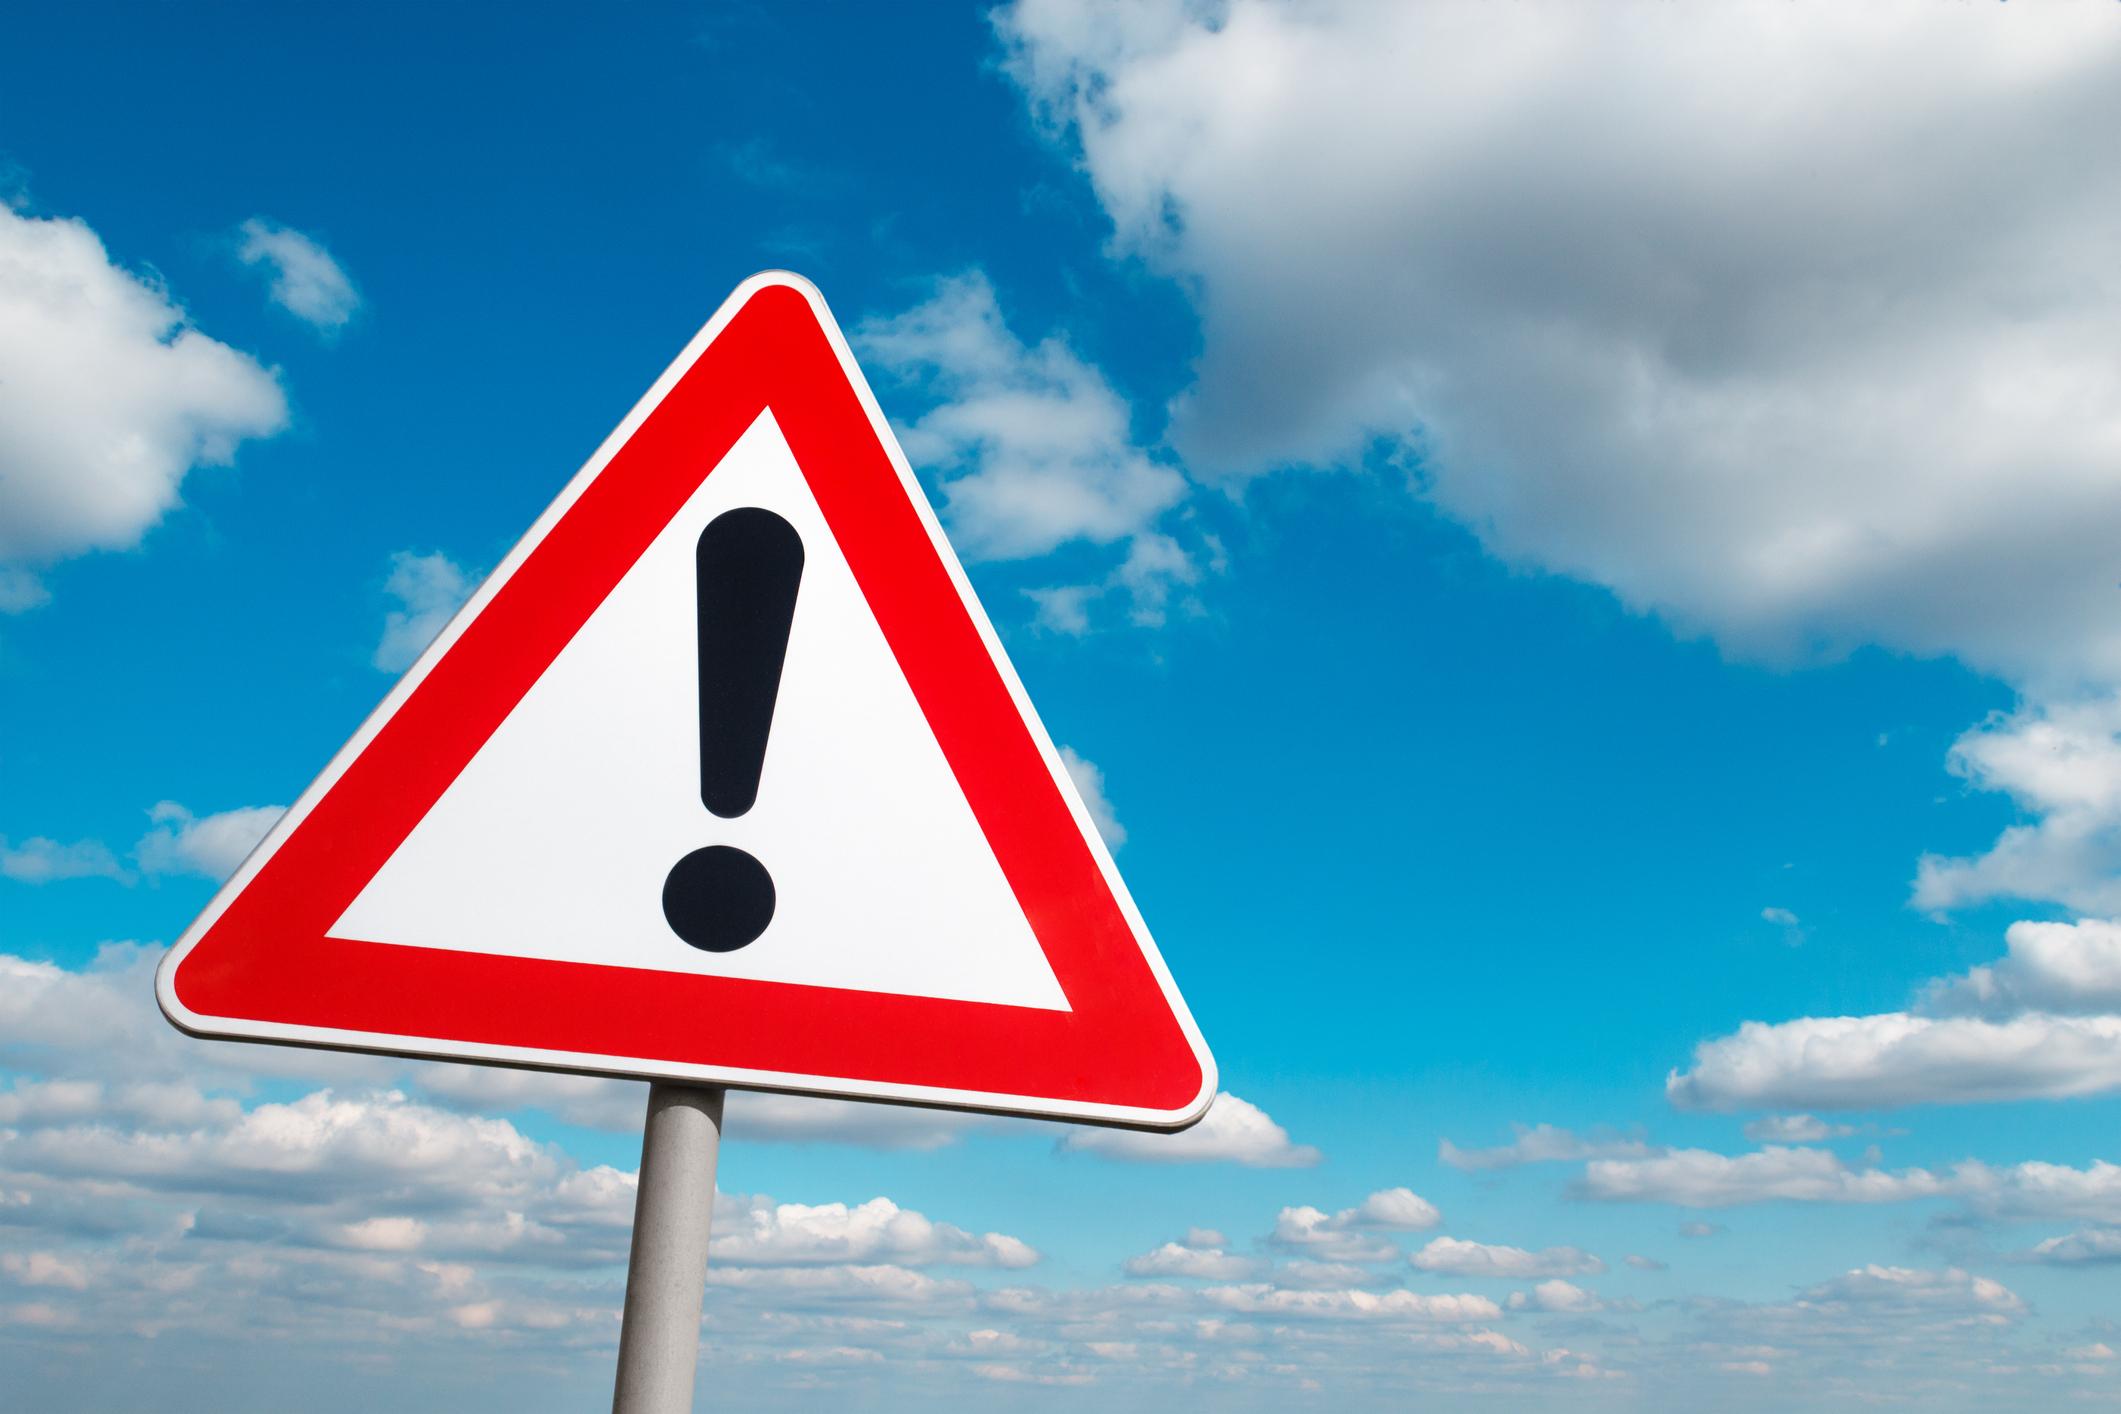 BIGLOBE WiMAXの口座振替契約はもはやおすすめできない